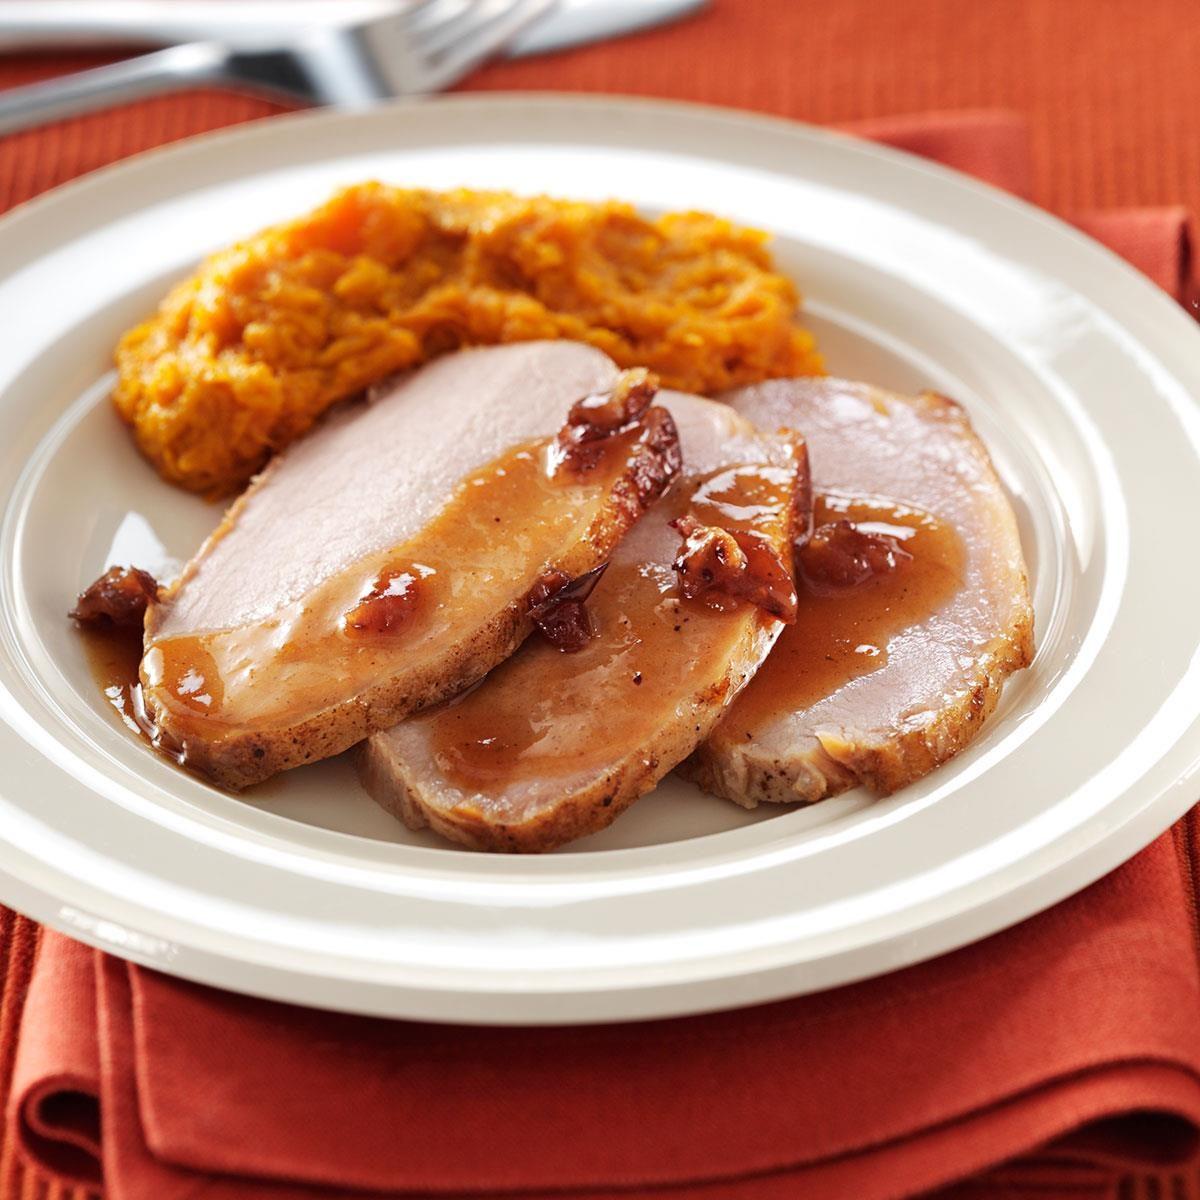 Taste Of Home Slow Cooker Pork Loin Recipes